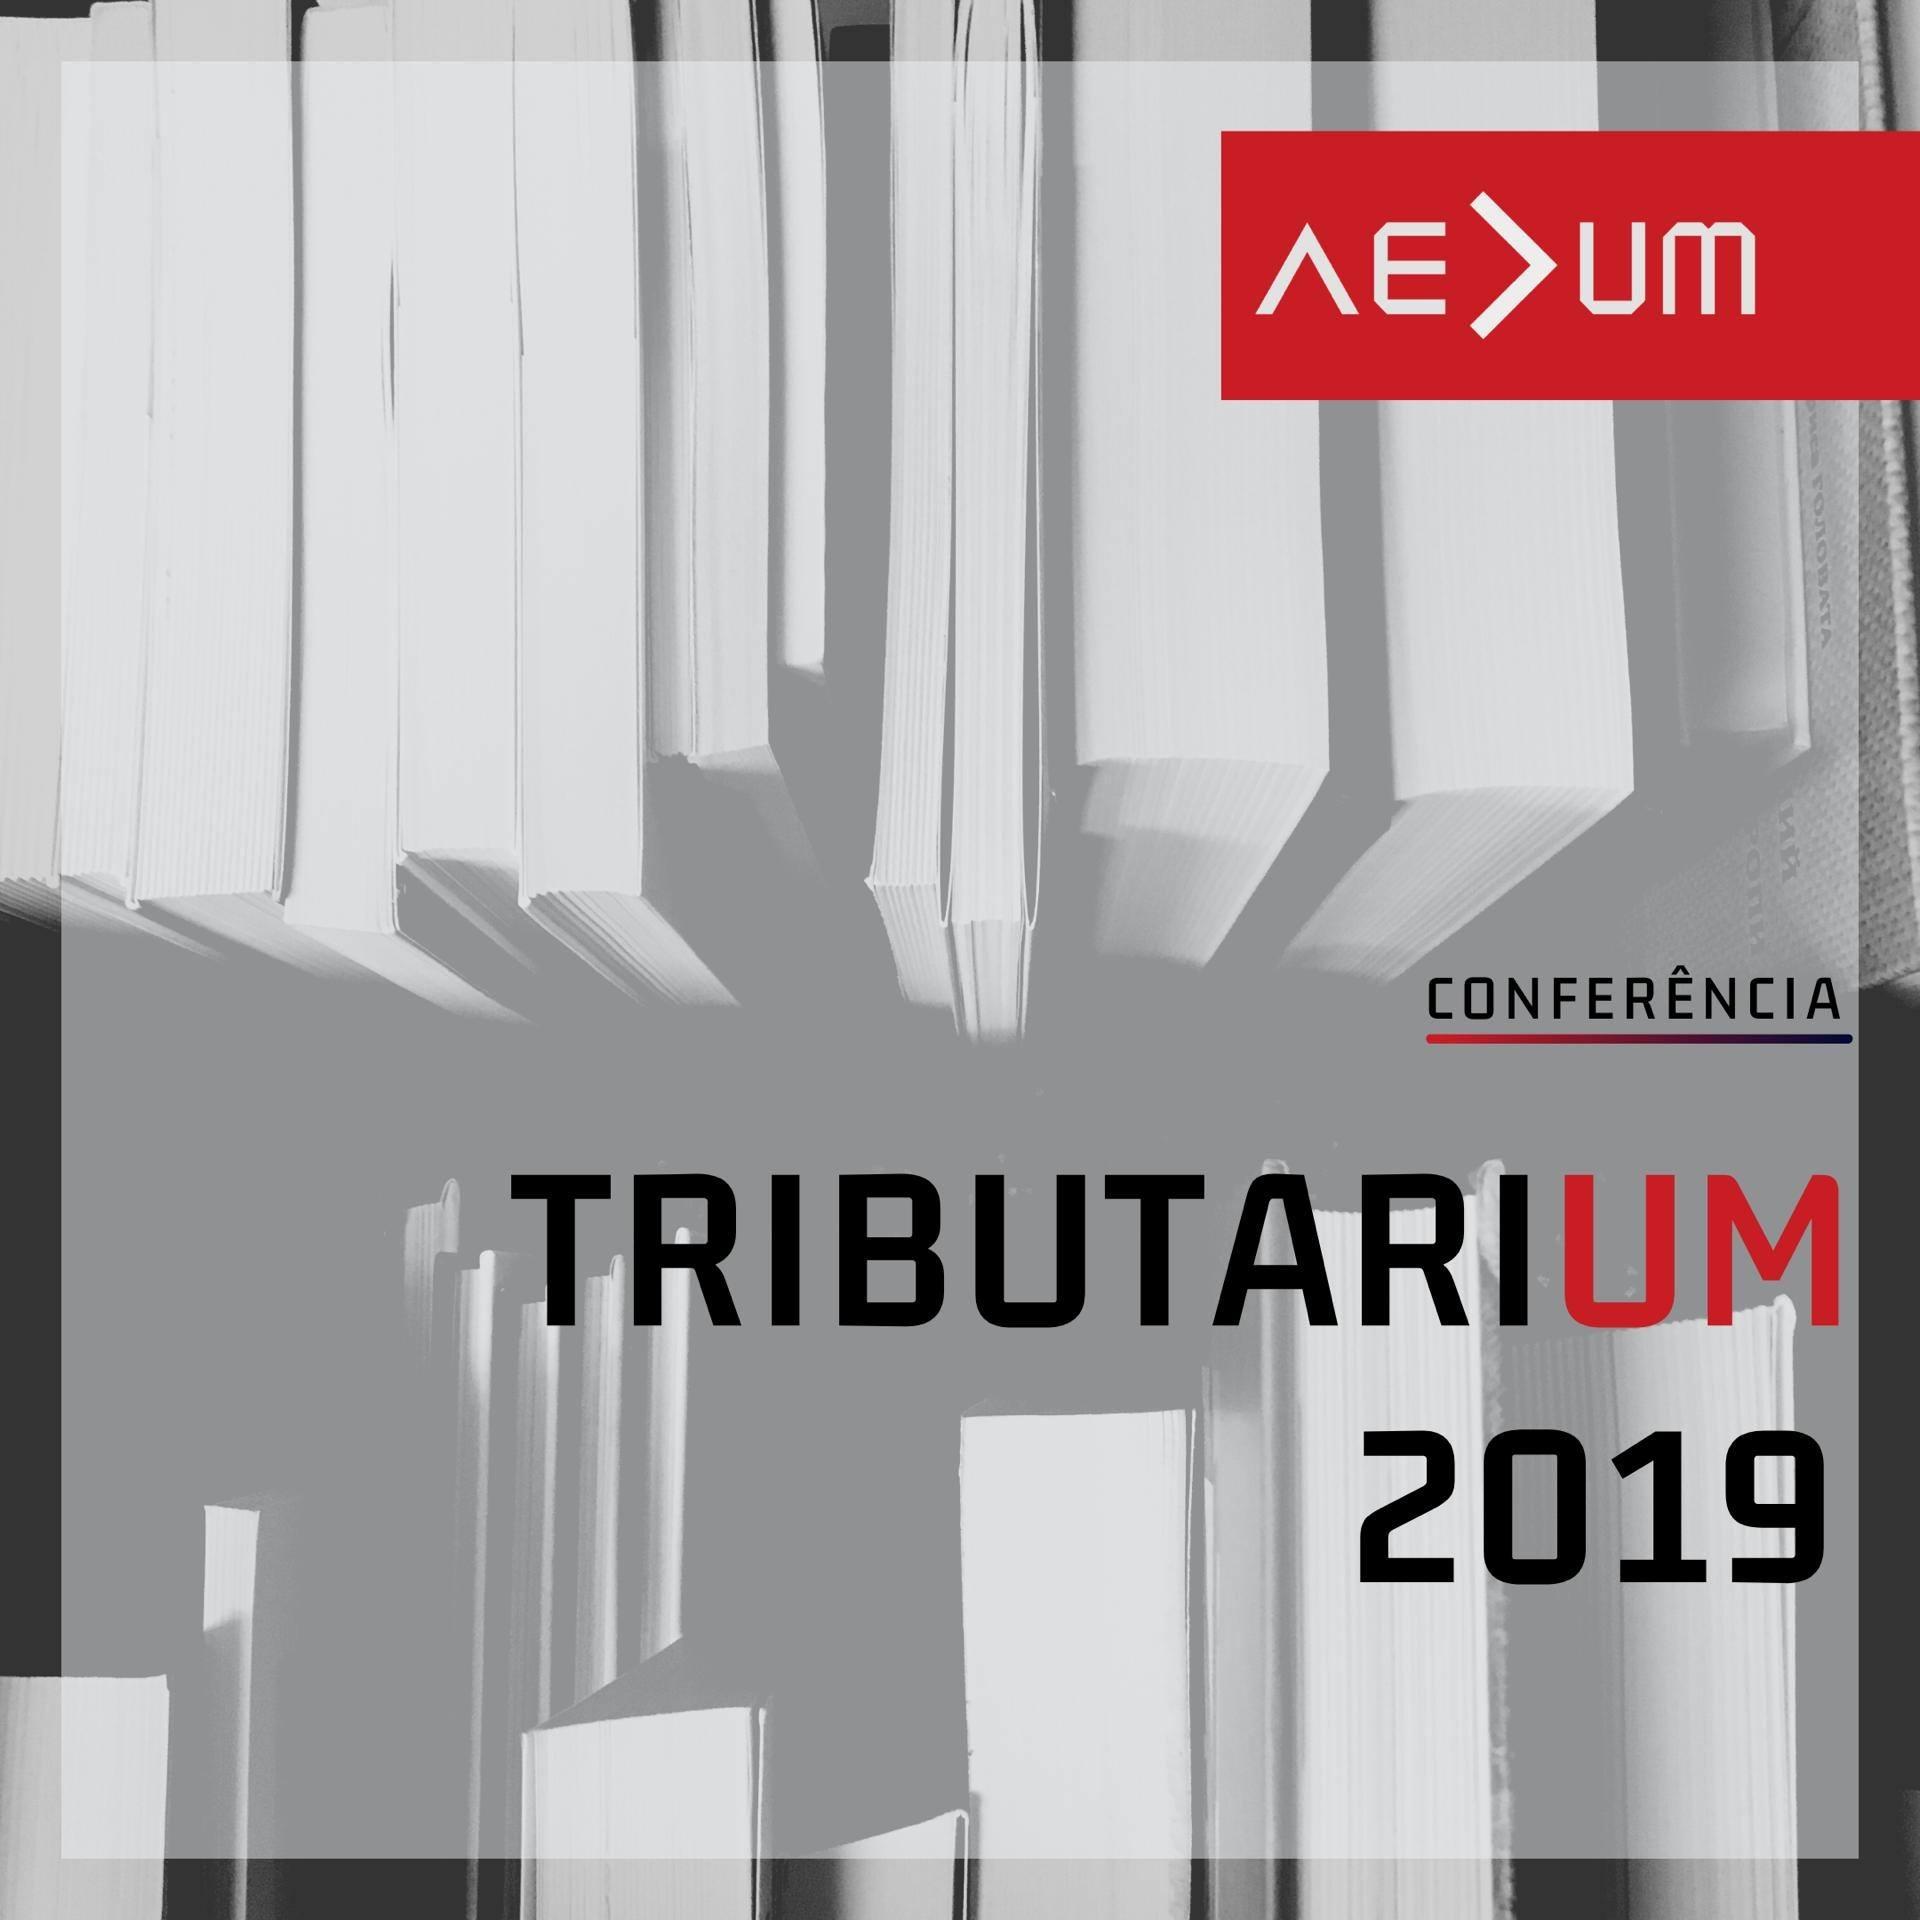 Conferência TributariUM 2019